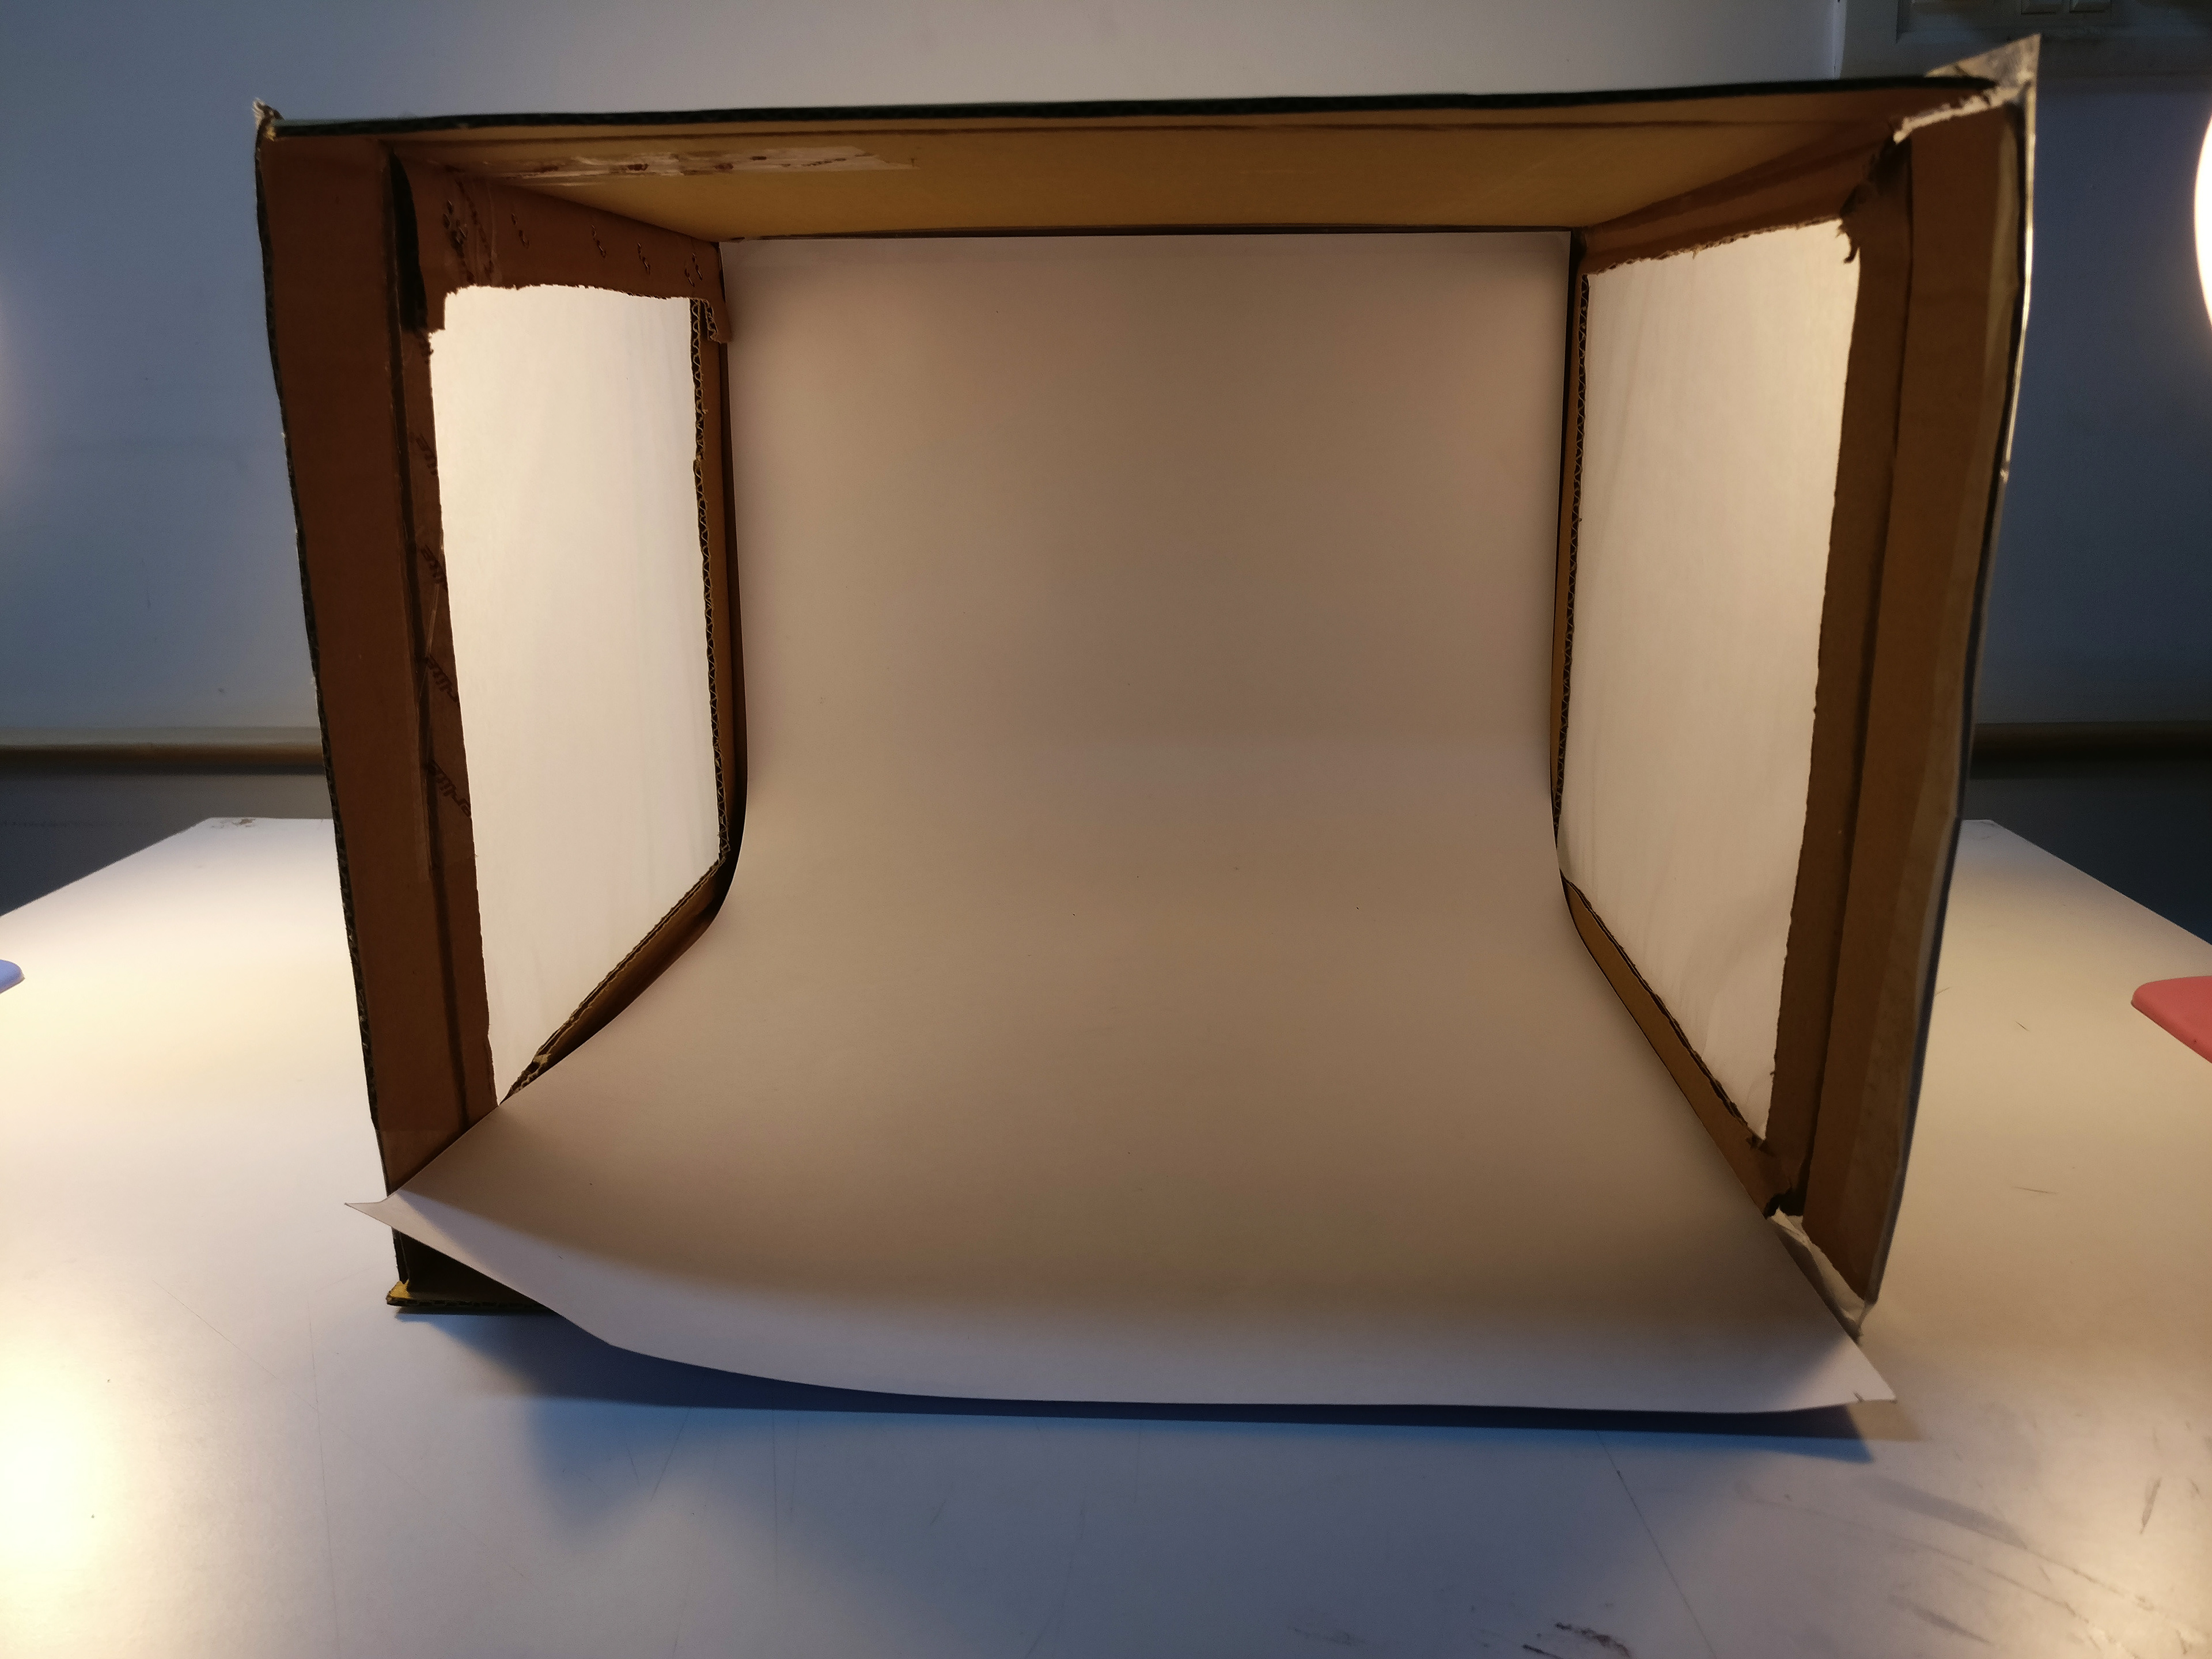 lighting product category lightbox design lightboxes light flag art photography box uk